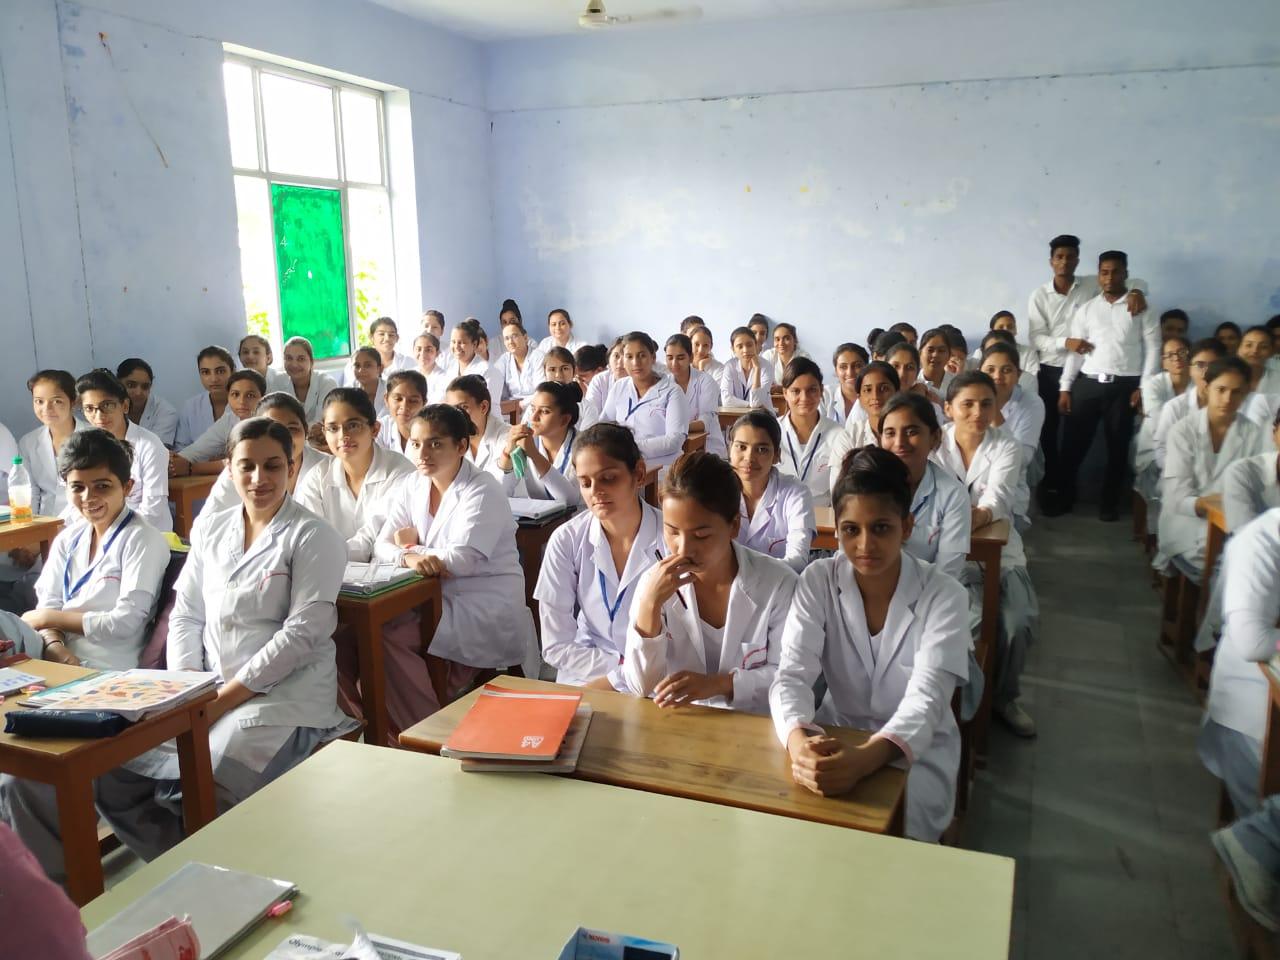 swami vivekanand nursing school.jpeg